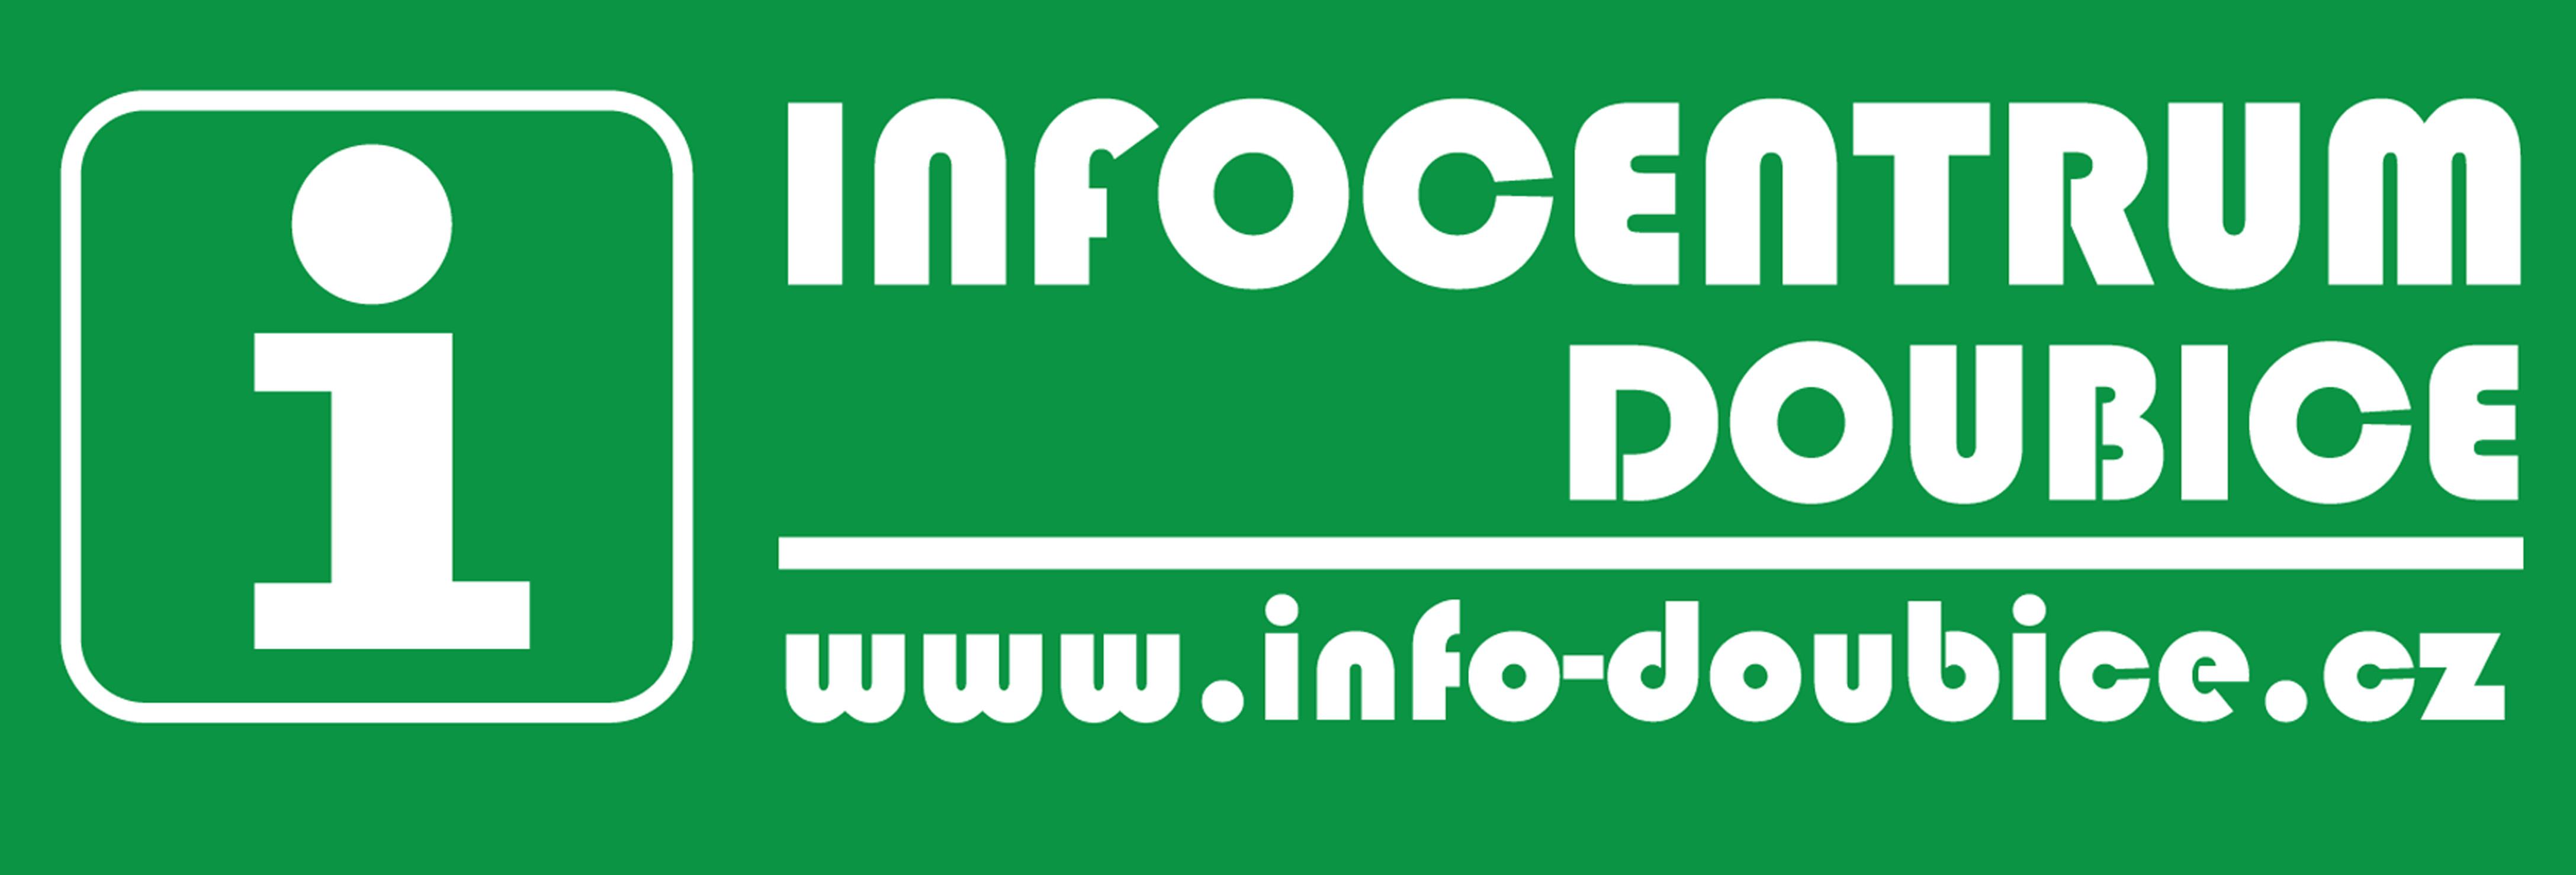 INFO LOGO infocentrum doubice.jpg